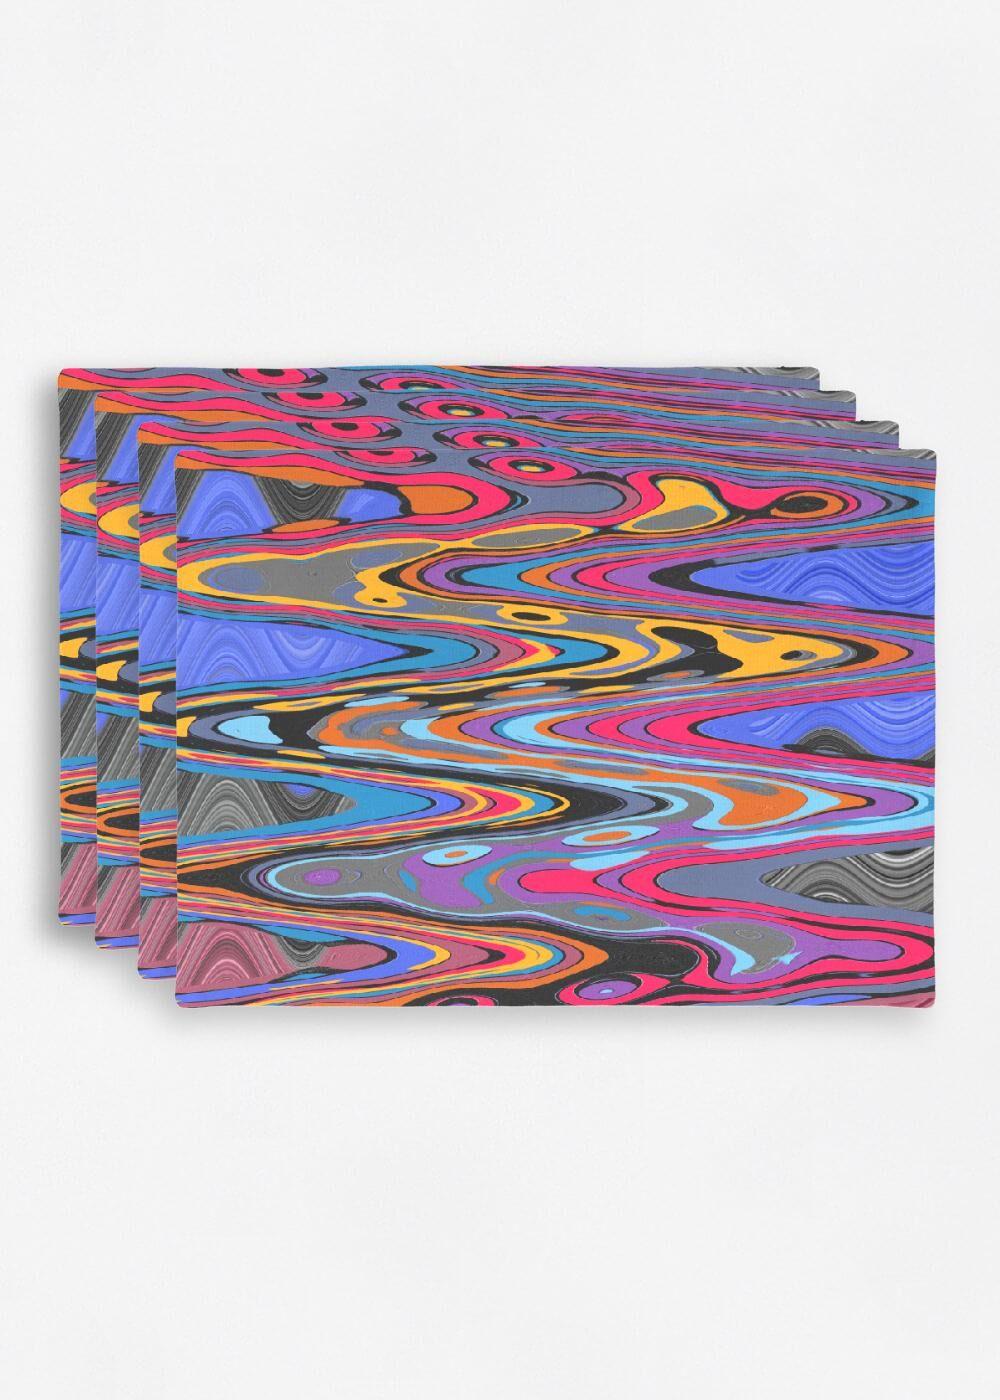 VIDA Placemat Set - Vibration Pop Music 2021 by VIDA Original Artist  - Size: Set of 4